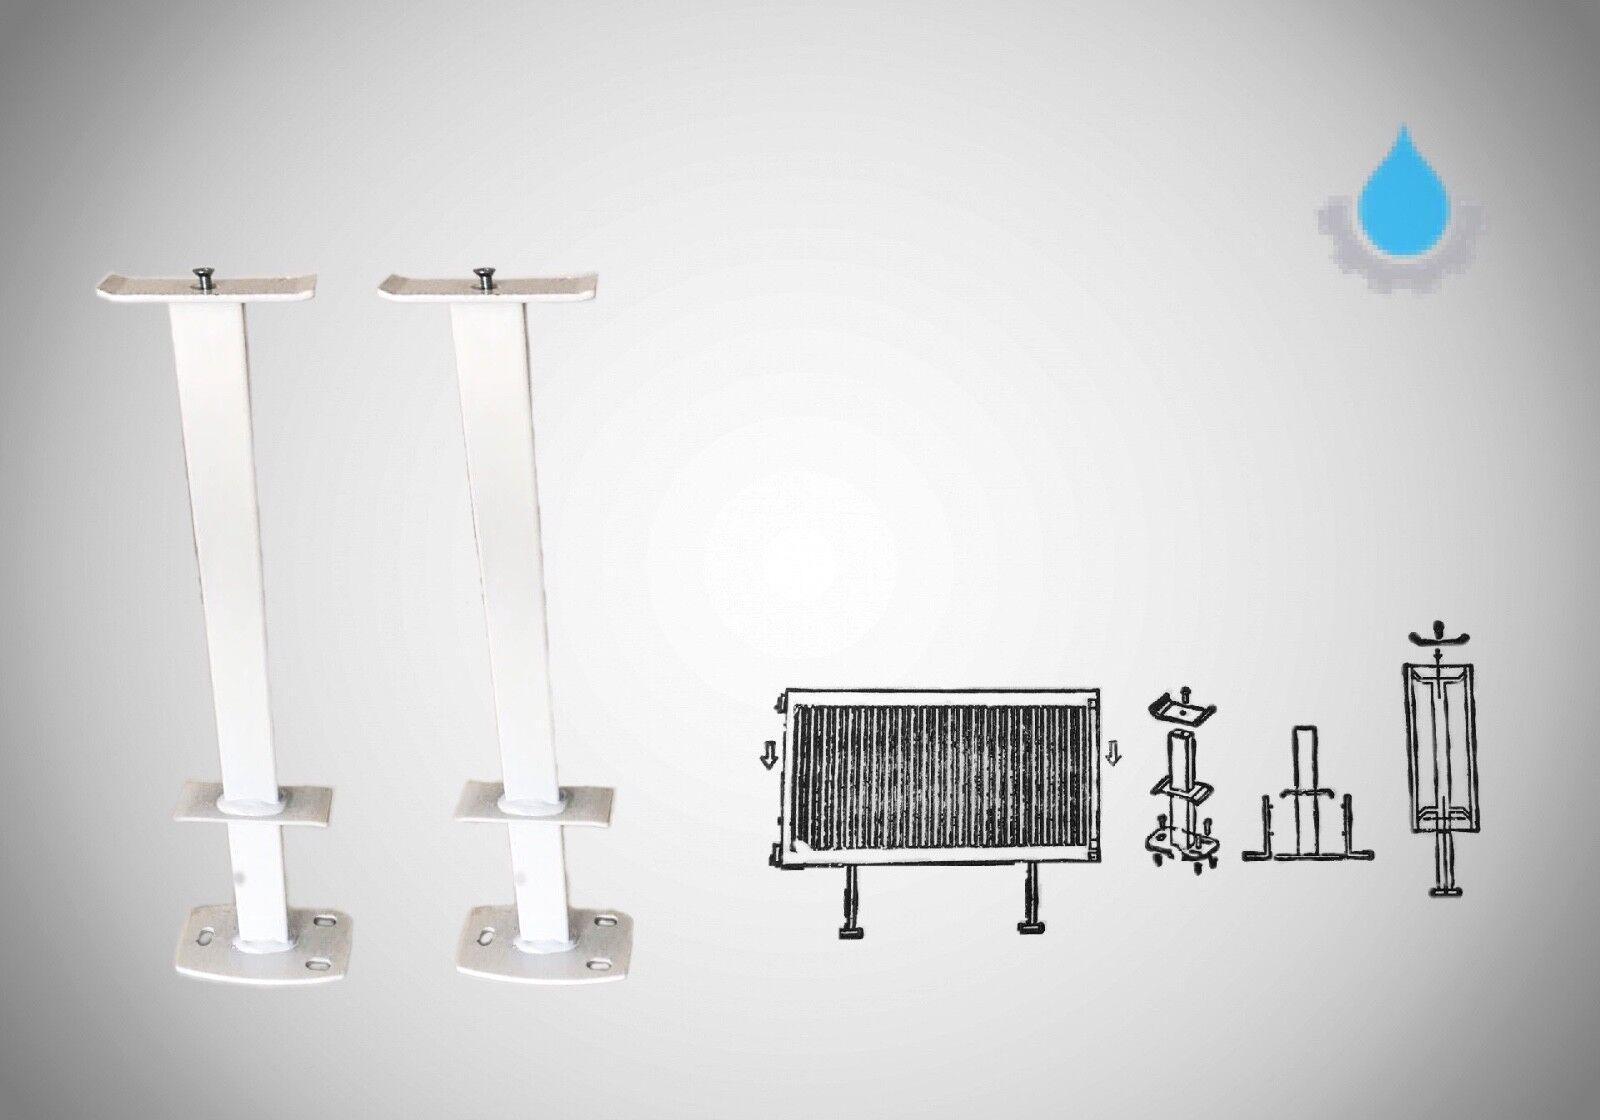 2x Standkonsole Standfuß Heizung Heizkörper Standfix Fuss BELRAD 600 mm (set)